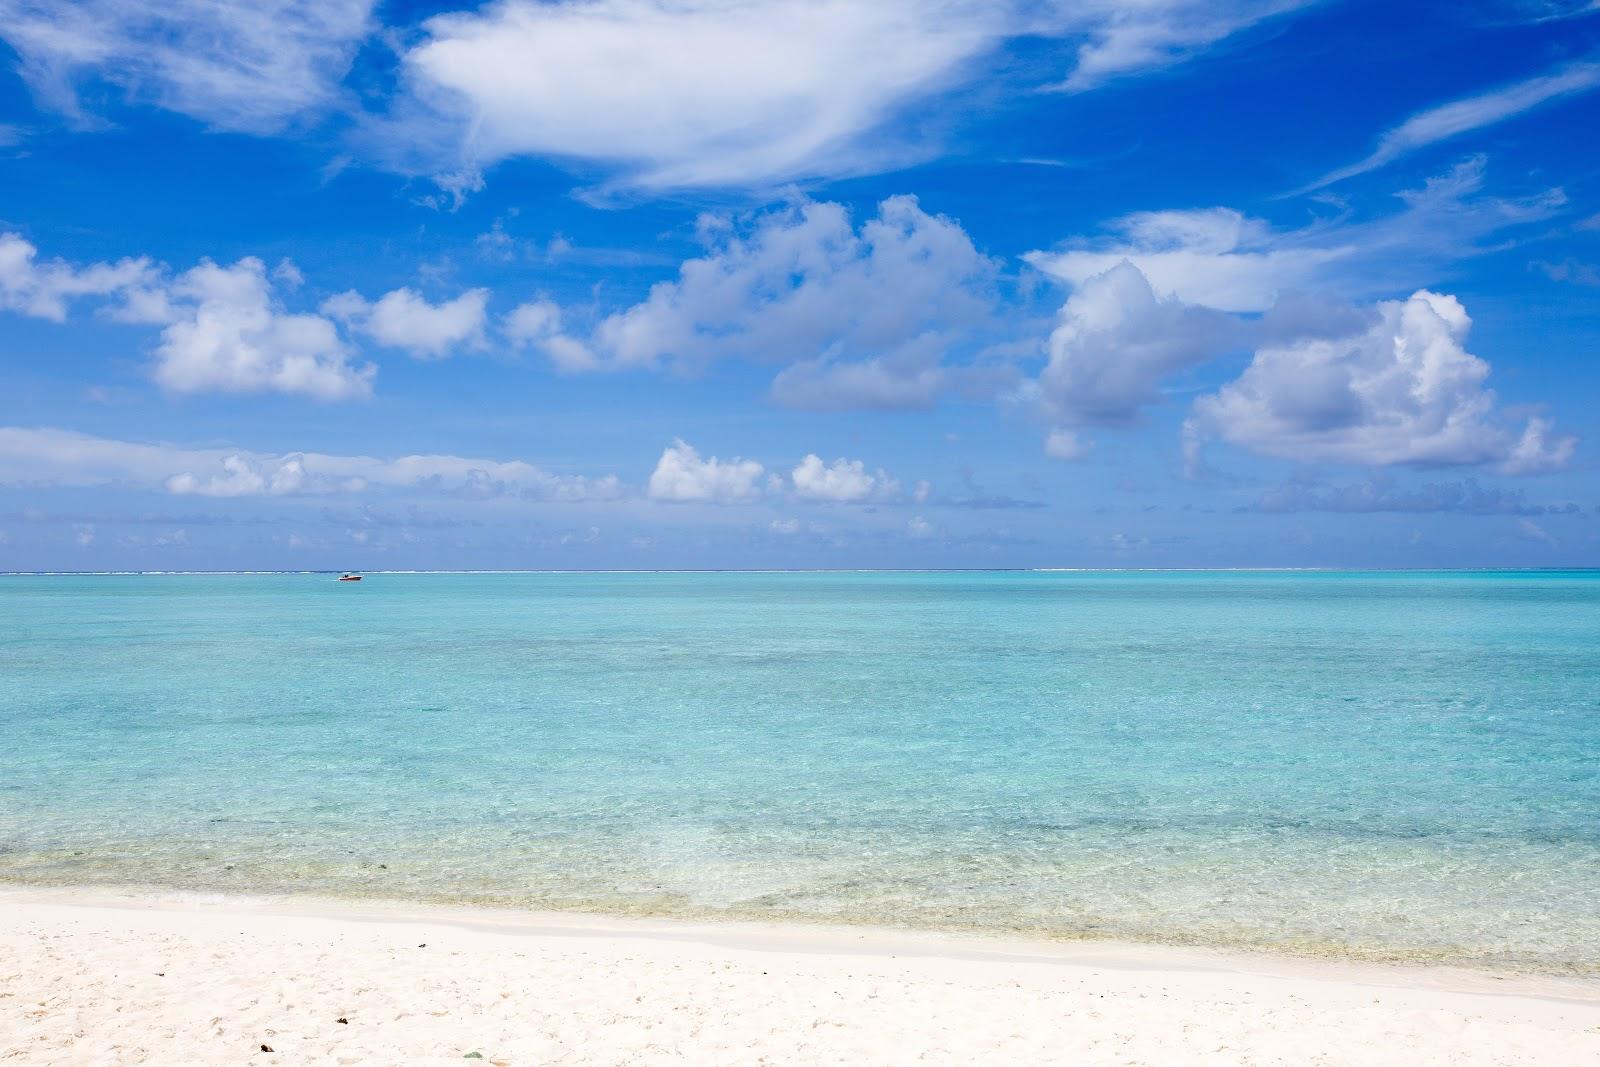 Bora Bora|Matira beach 馬蒂拉海灘,全世界最美最特別的海灘之一